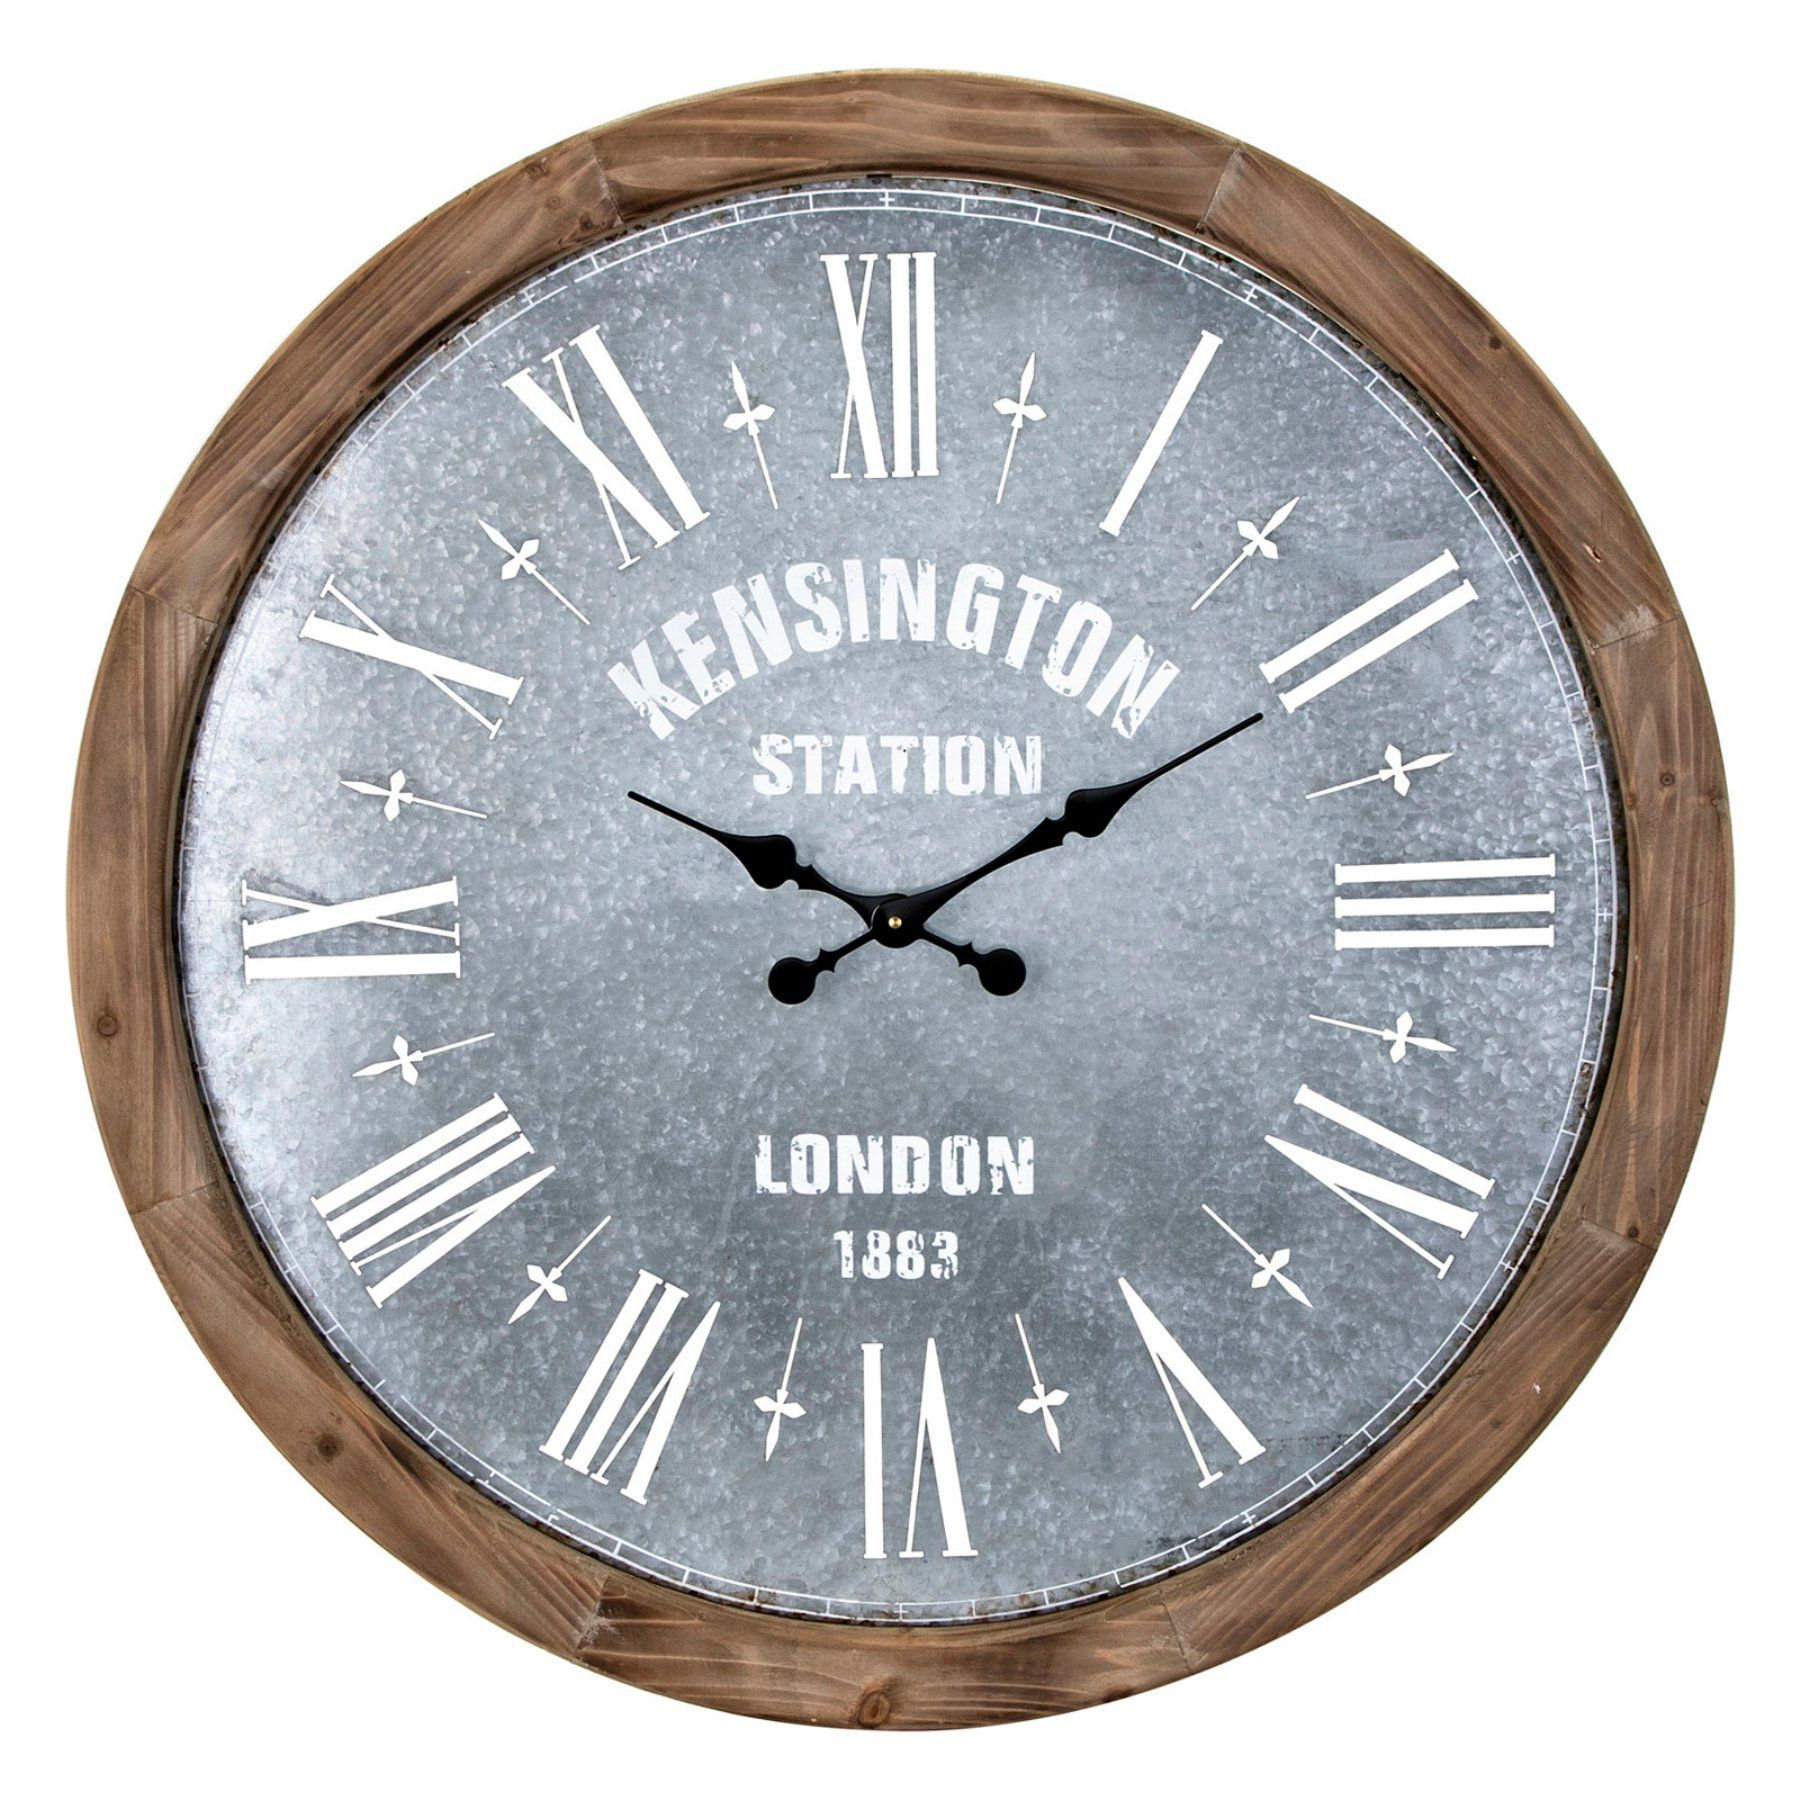 Imax Grant Oversized Wall Clock 30w X 30h In 16302 Clock Rustic Wall Clocks Clock Decor